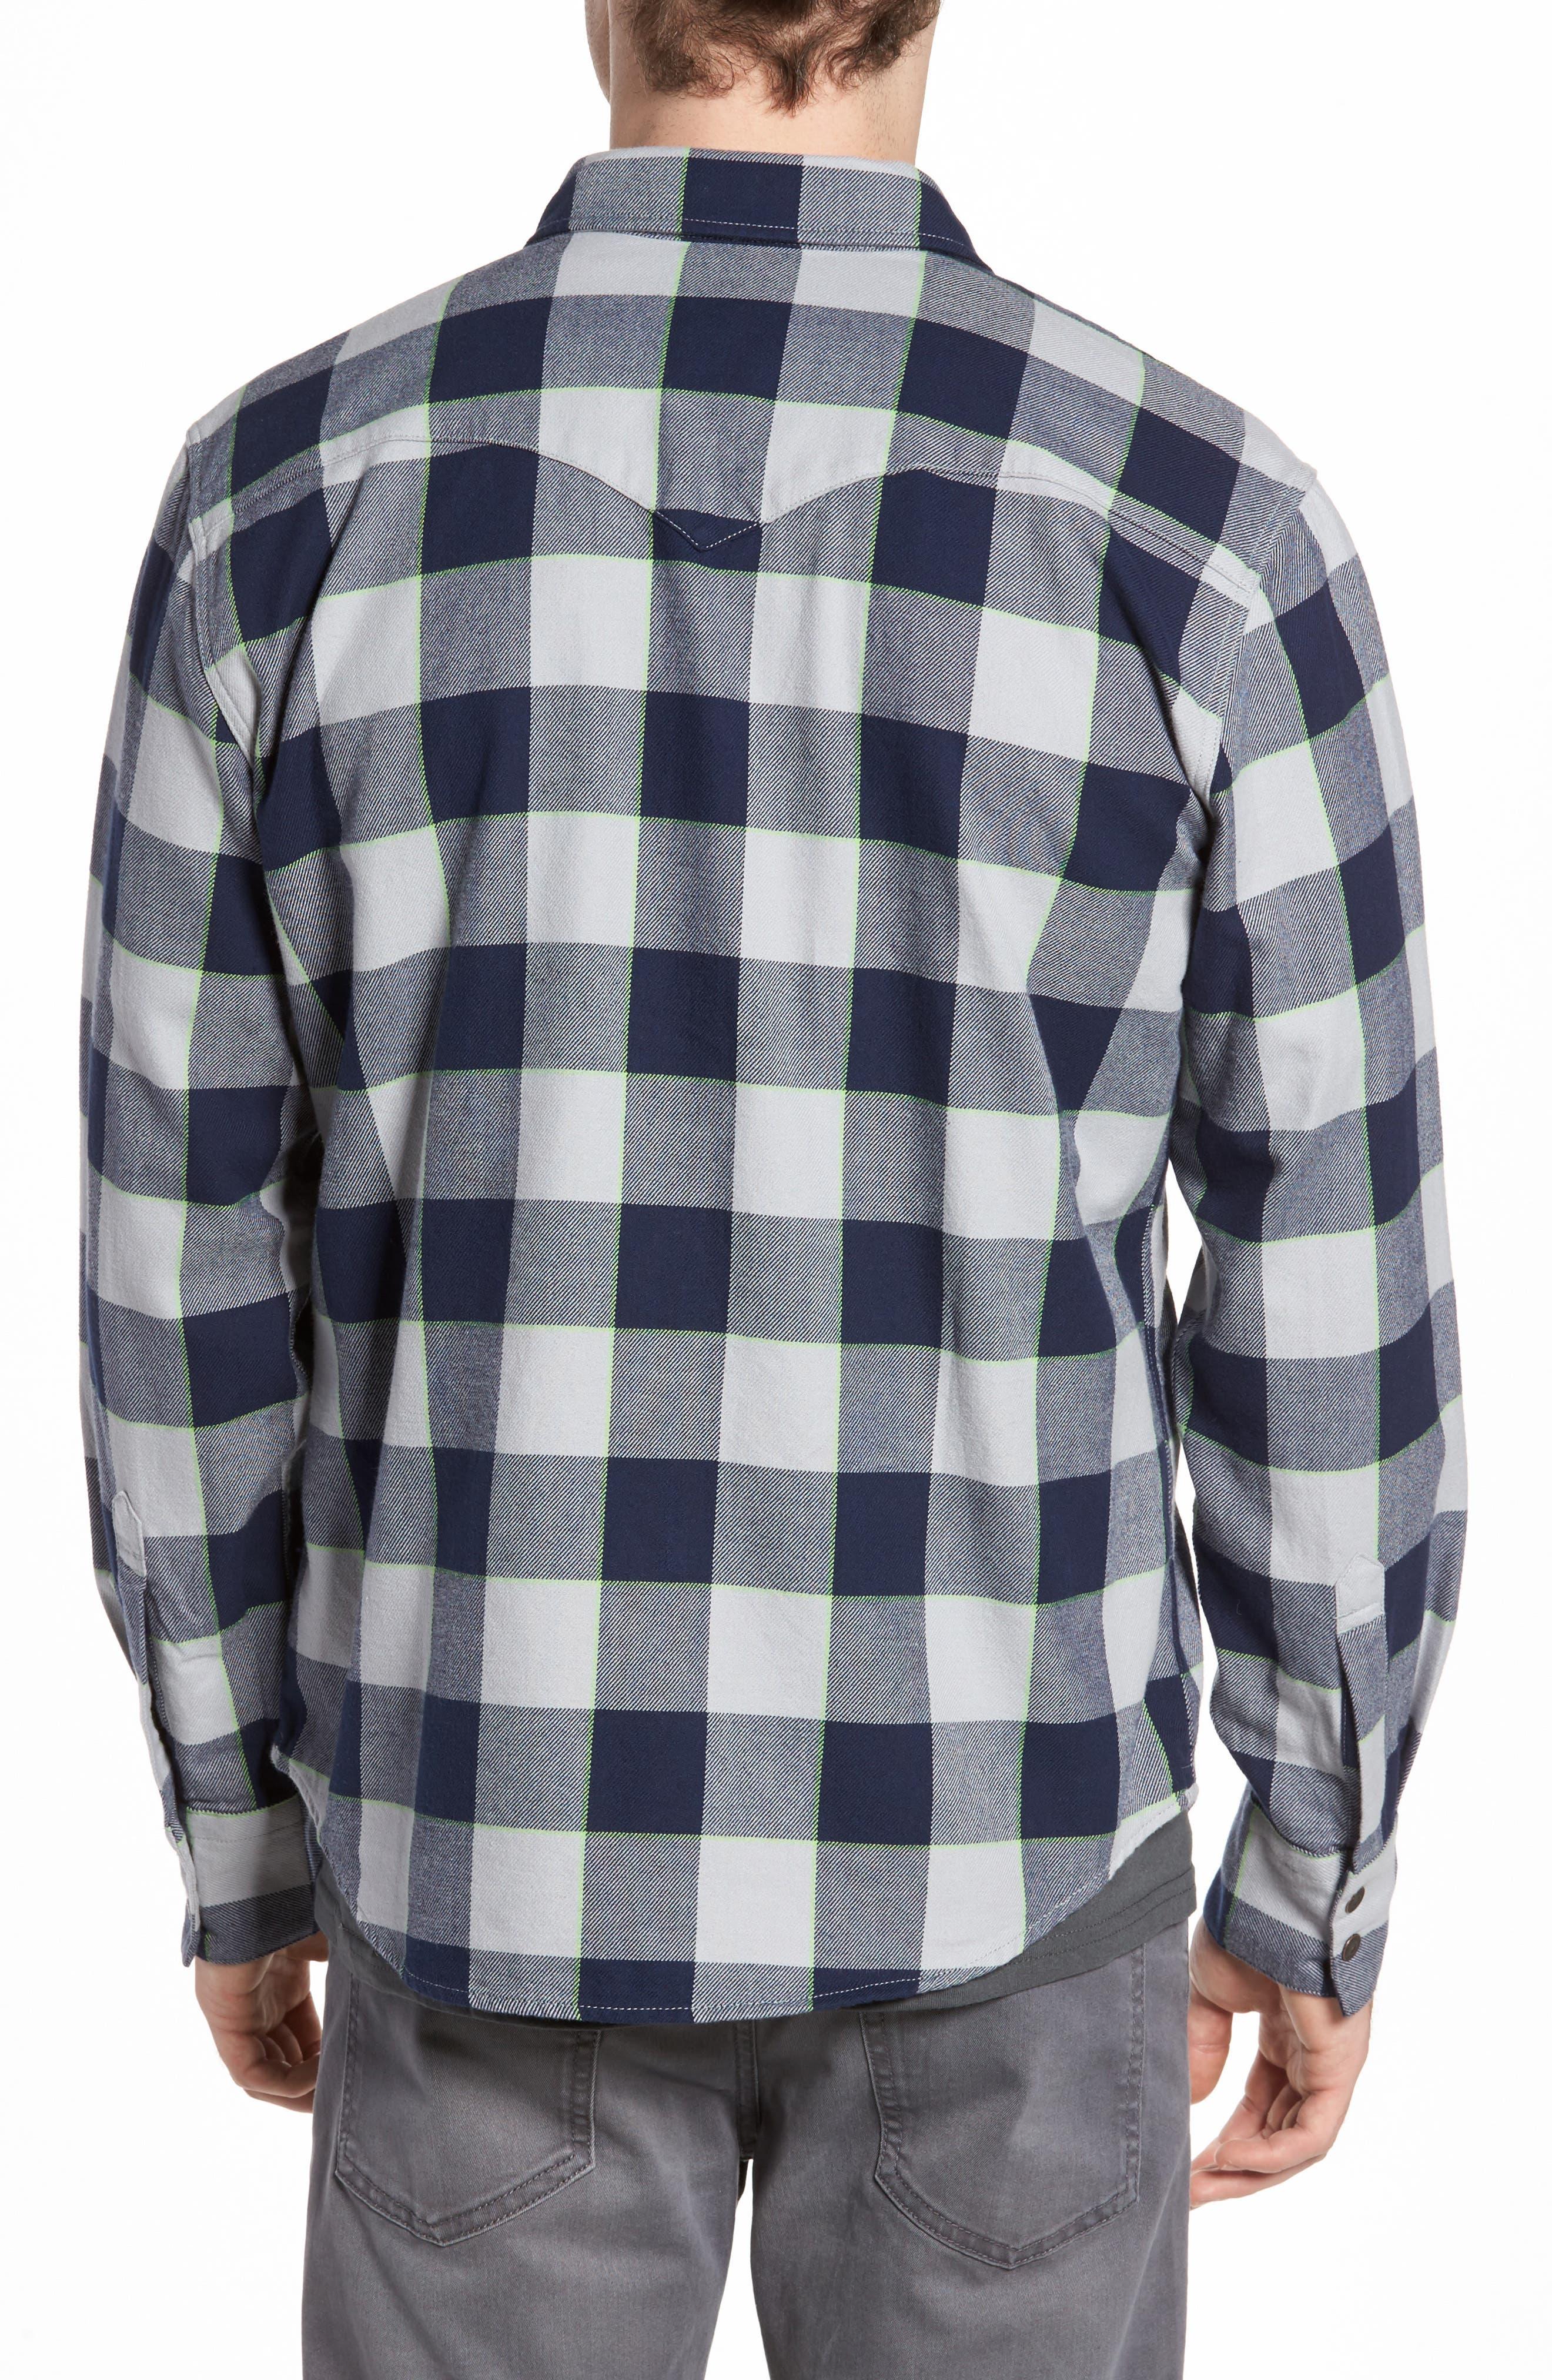 Alternate Image 2  - Levi's® NFL Seahawks - Barstow Plaid Western Shirt